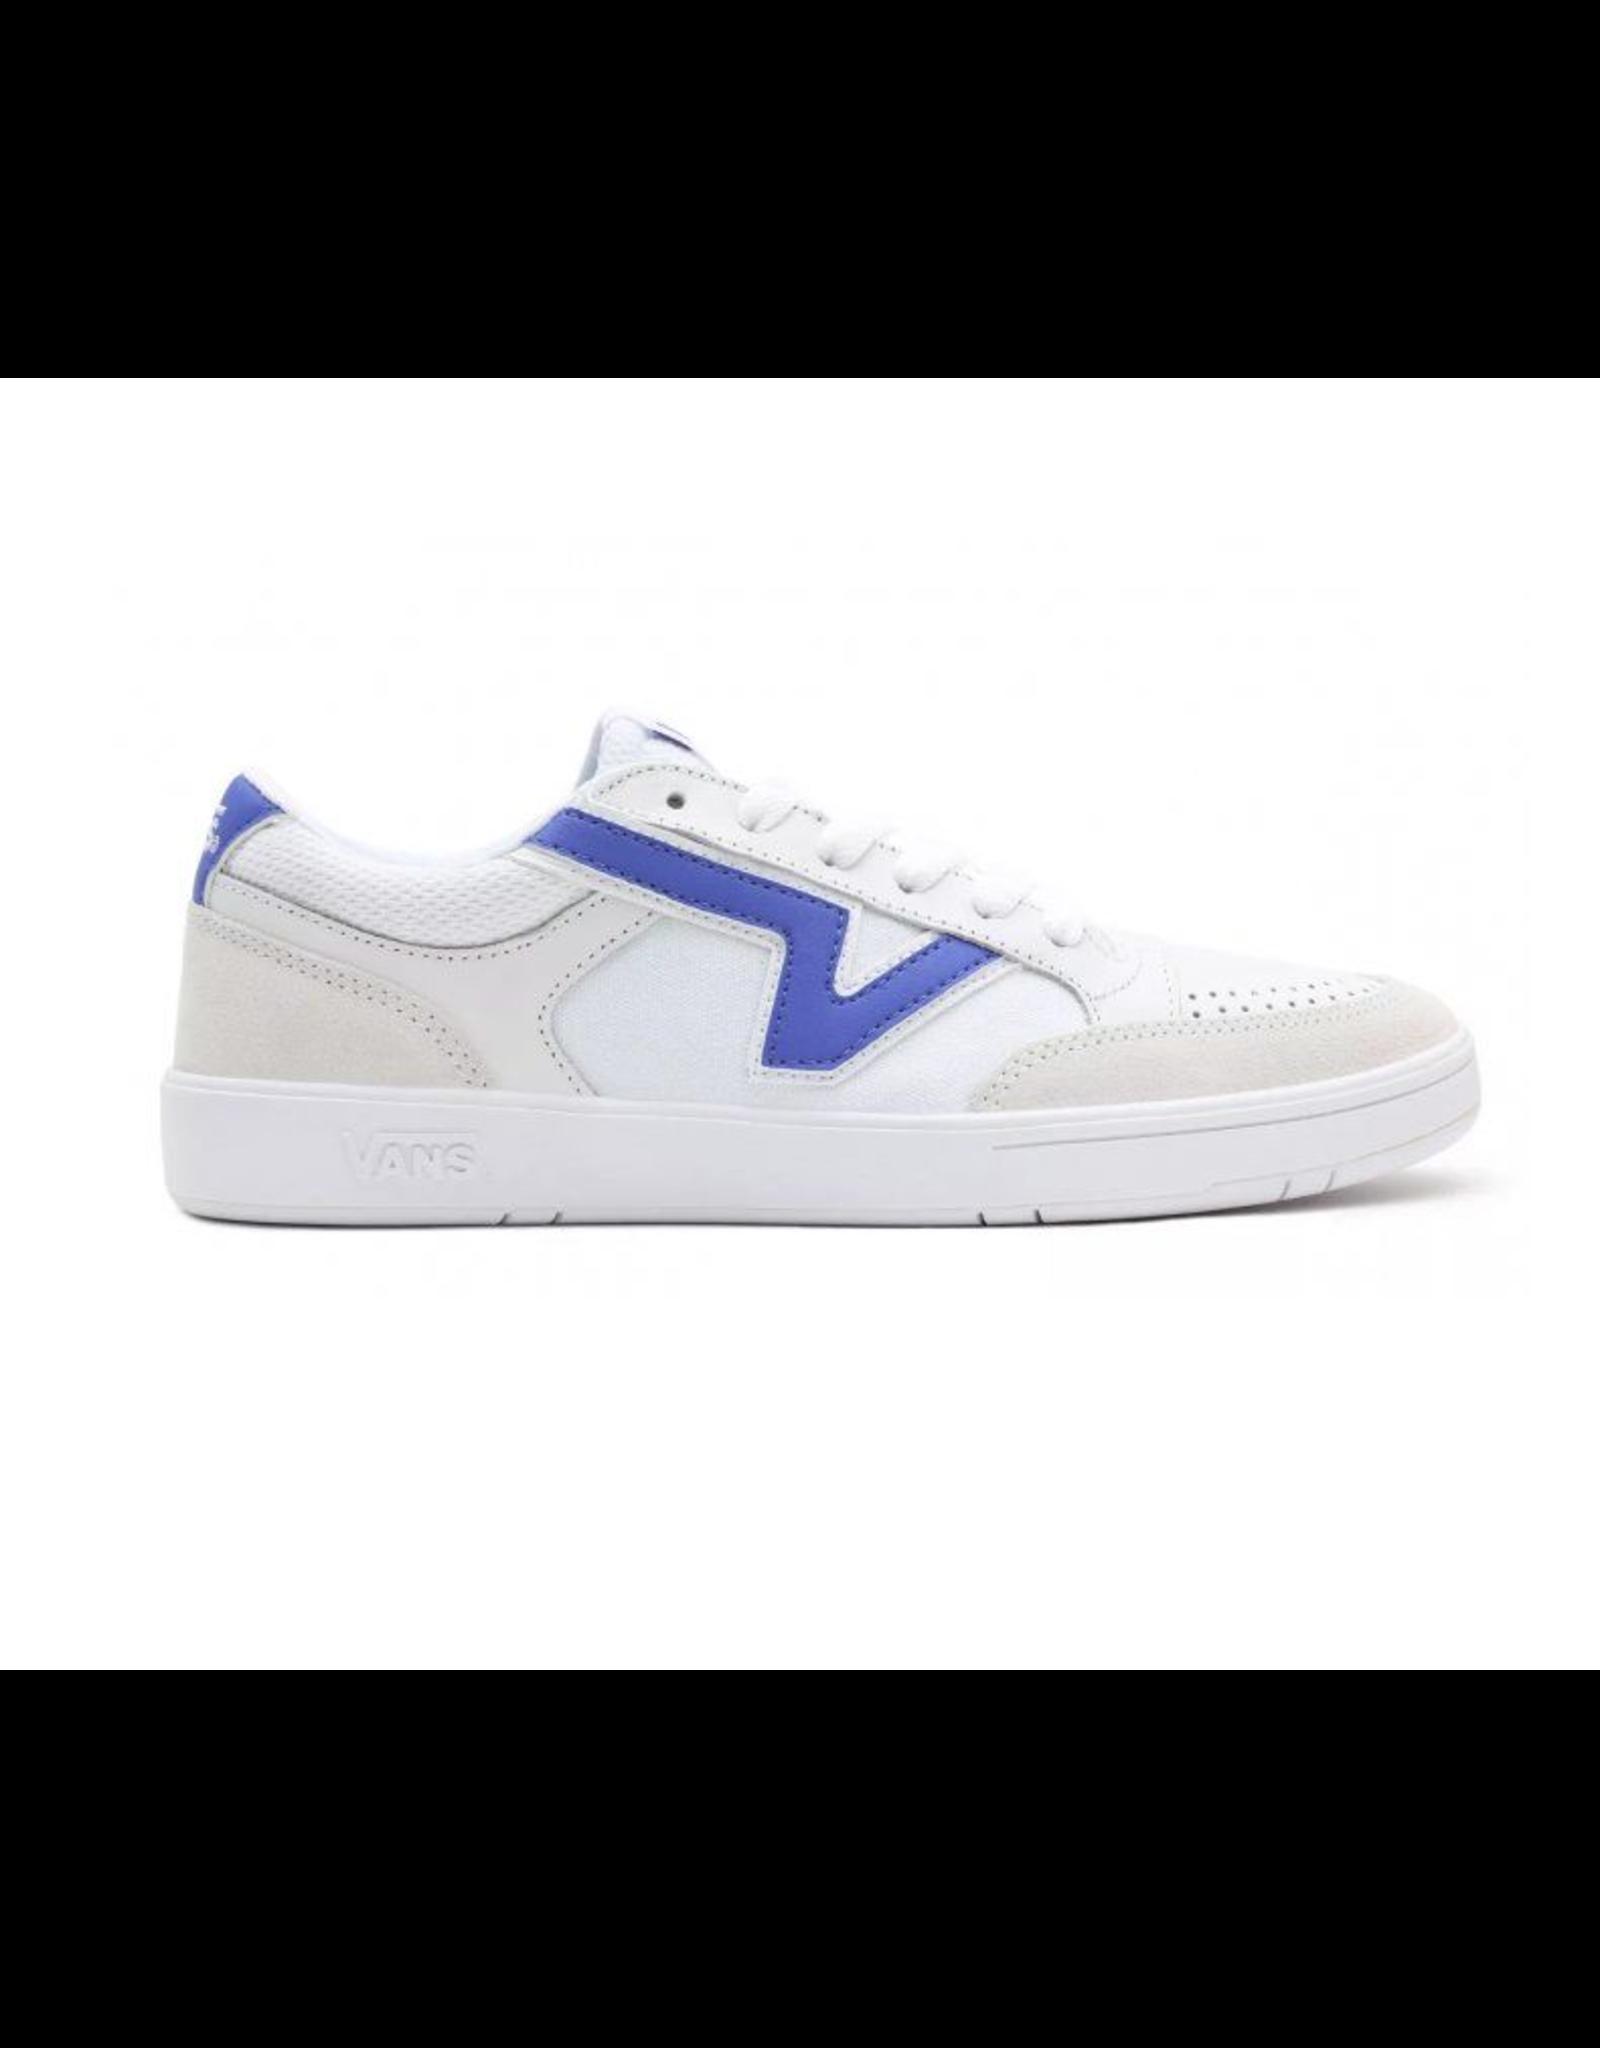 Vans Court Lowland CC - True White/Baja Blue